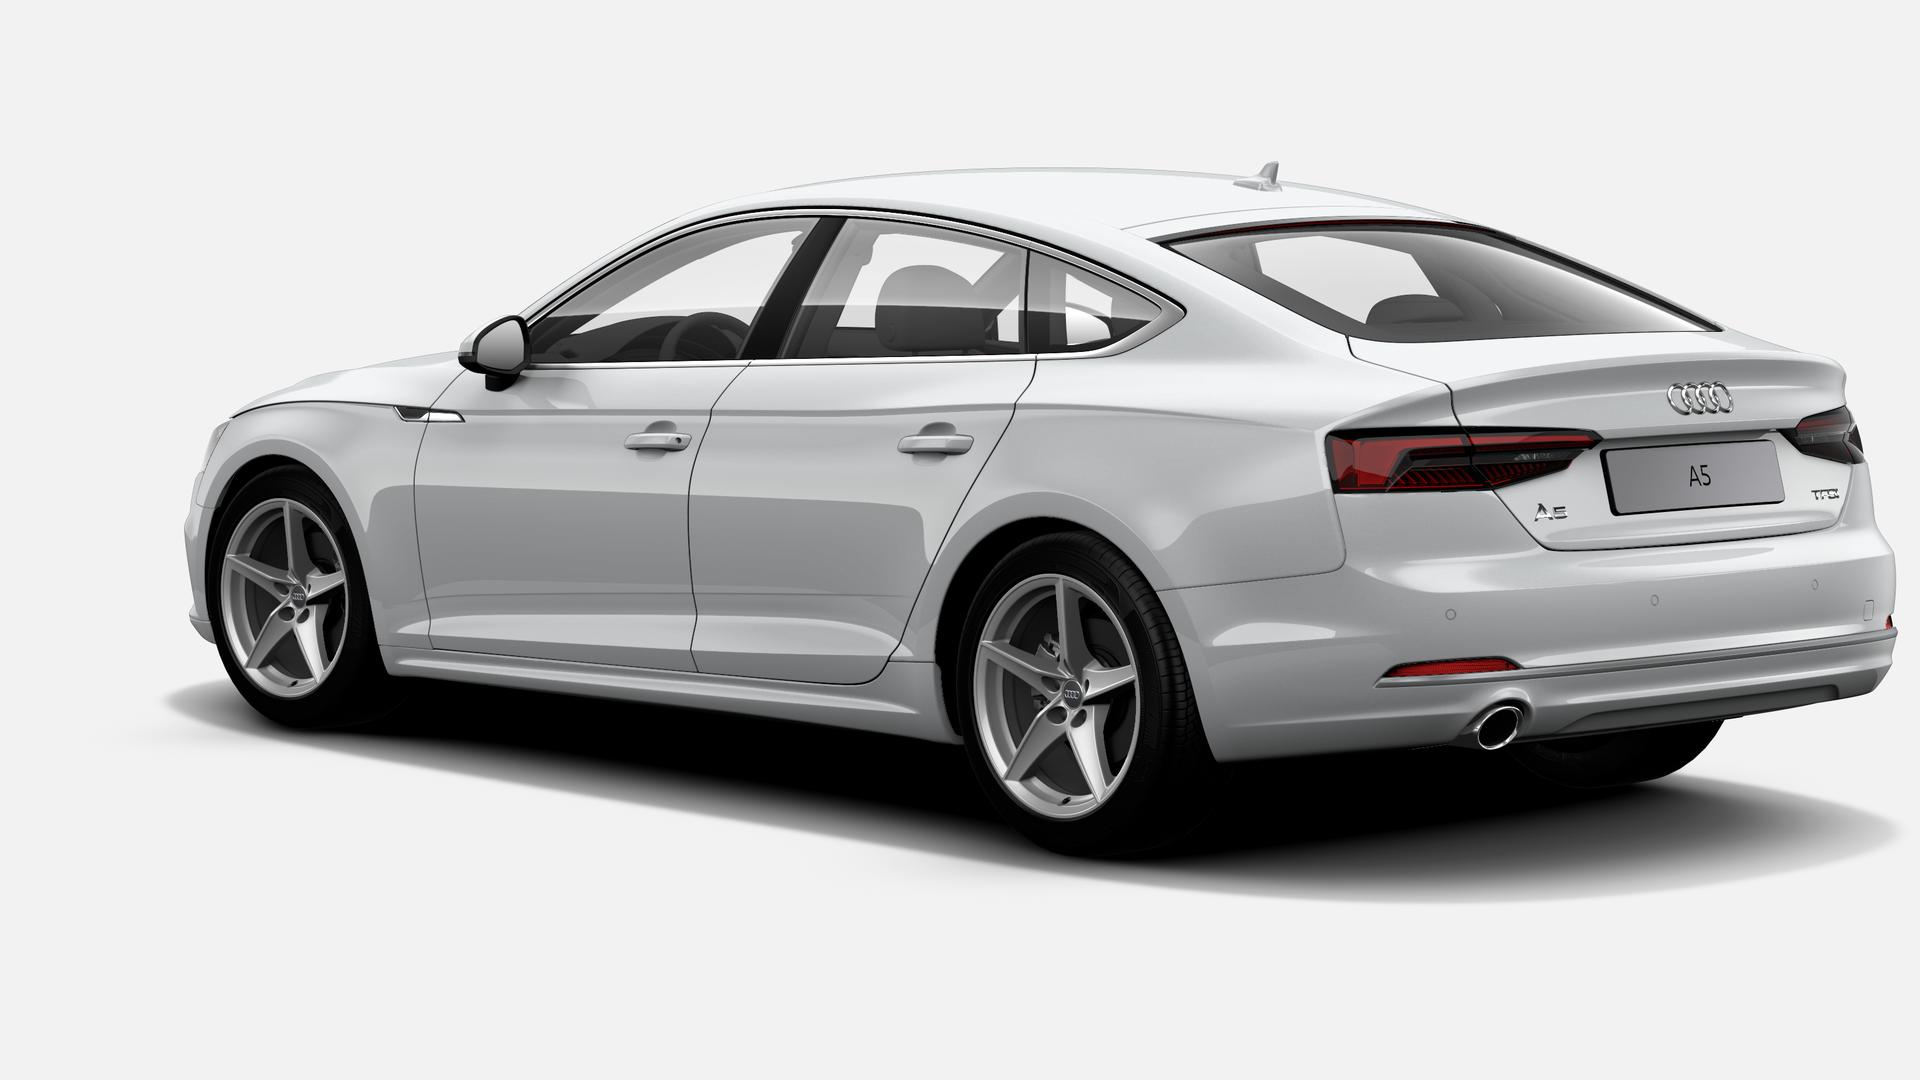 Vista Tres cuartos trasera izquierda de Audi A5 Sportback 1.4 TFSI sport S tronic 110 kW (150 CV)